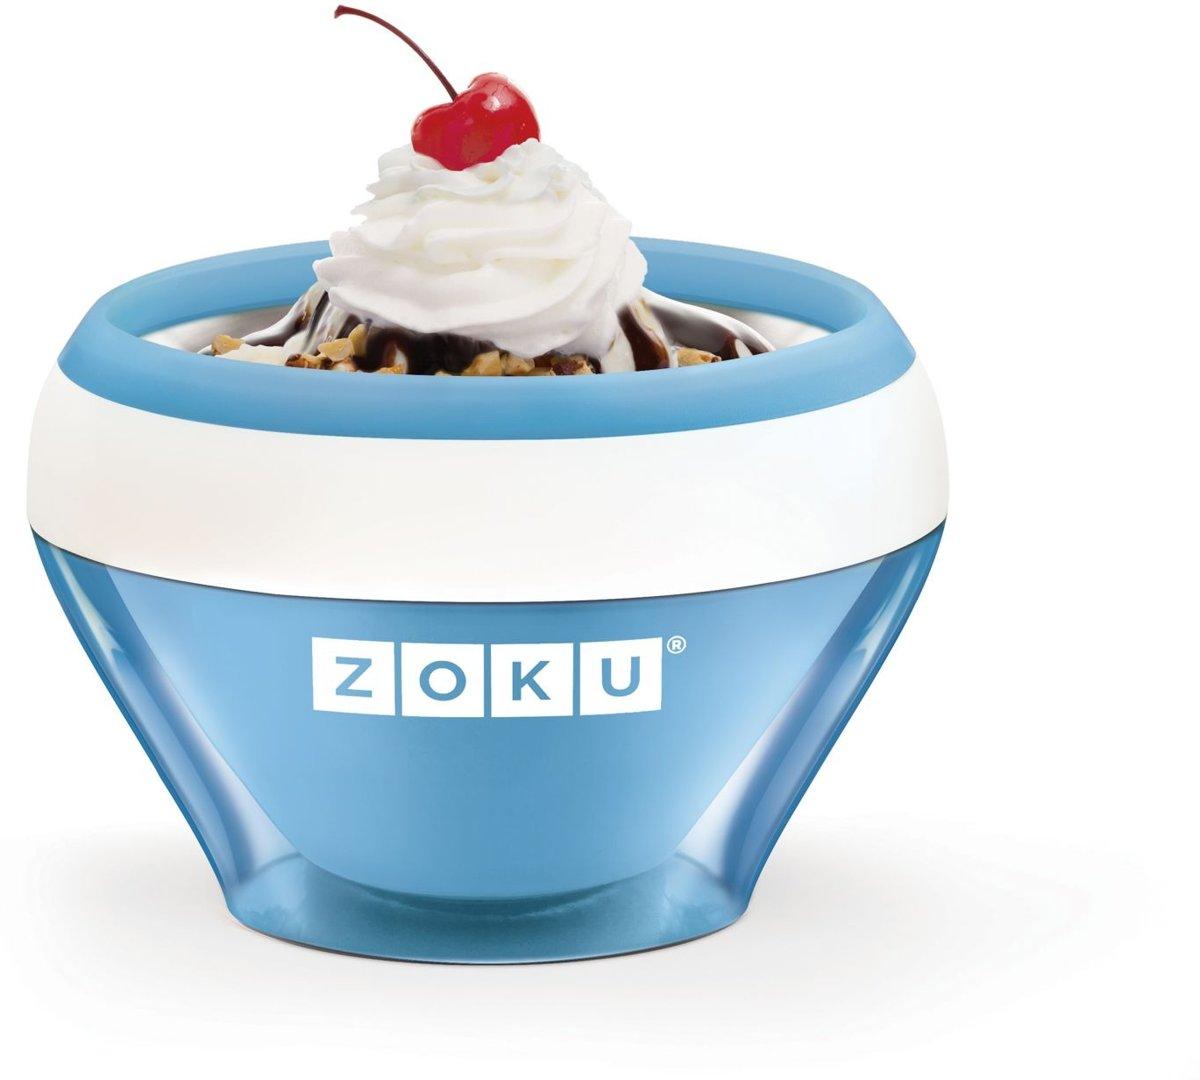 ZOKU Ice Cream Maker - Blauw kopen